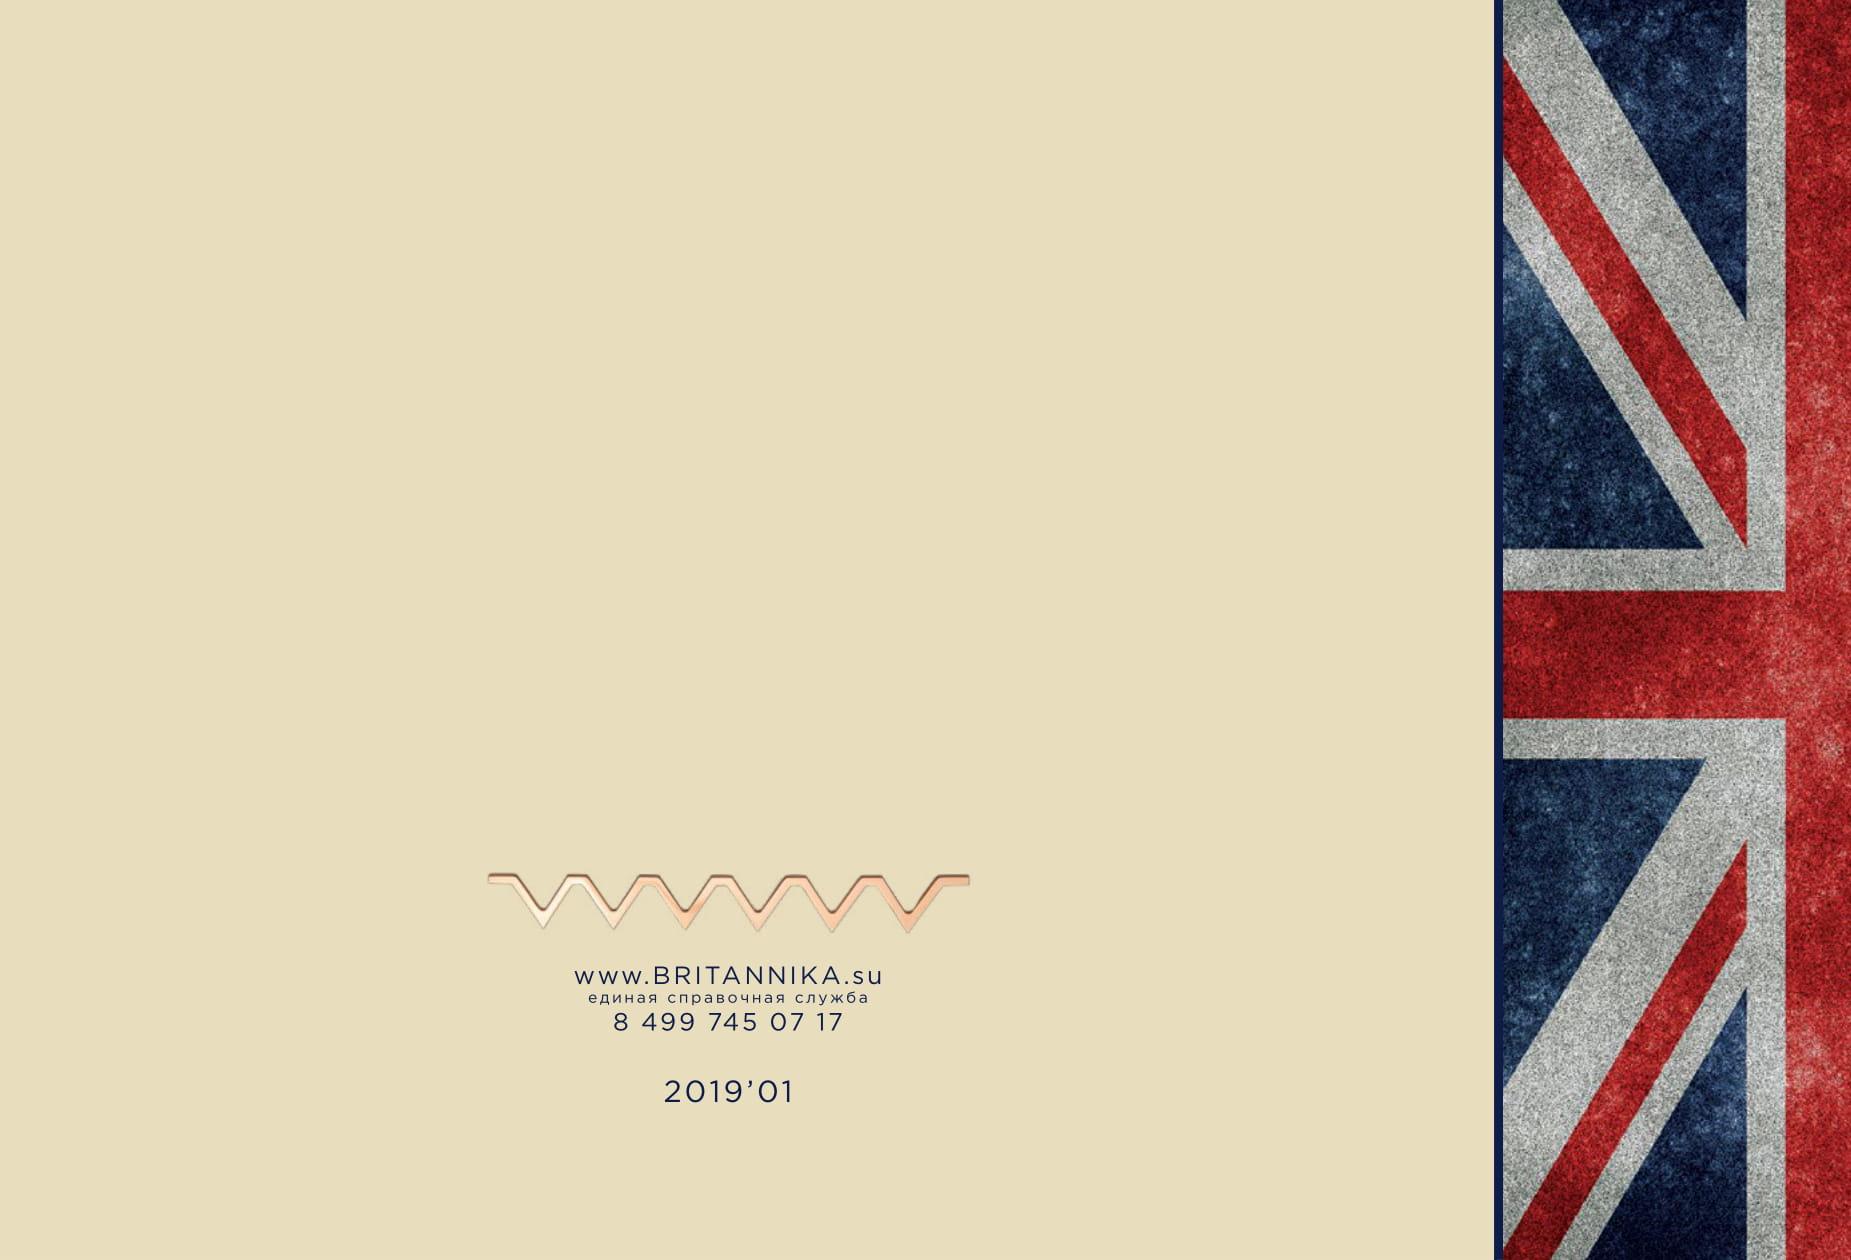 BritannicaCatalogue_2019'01_eMail-156